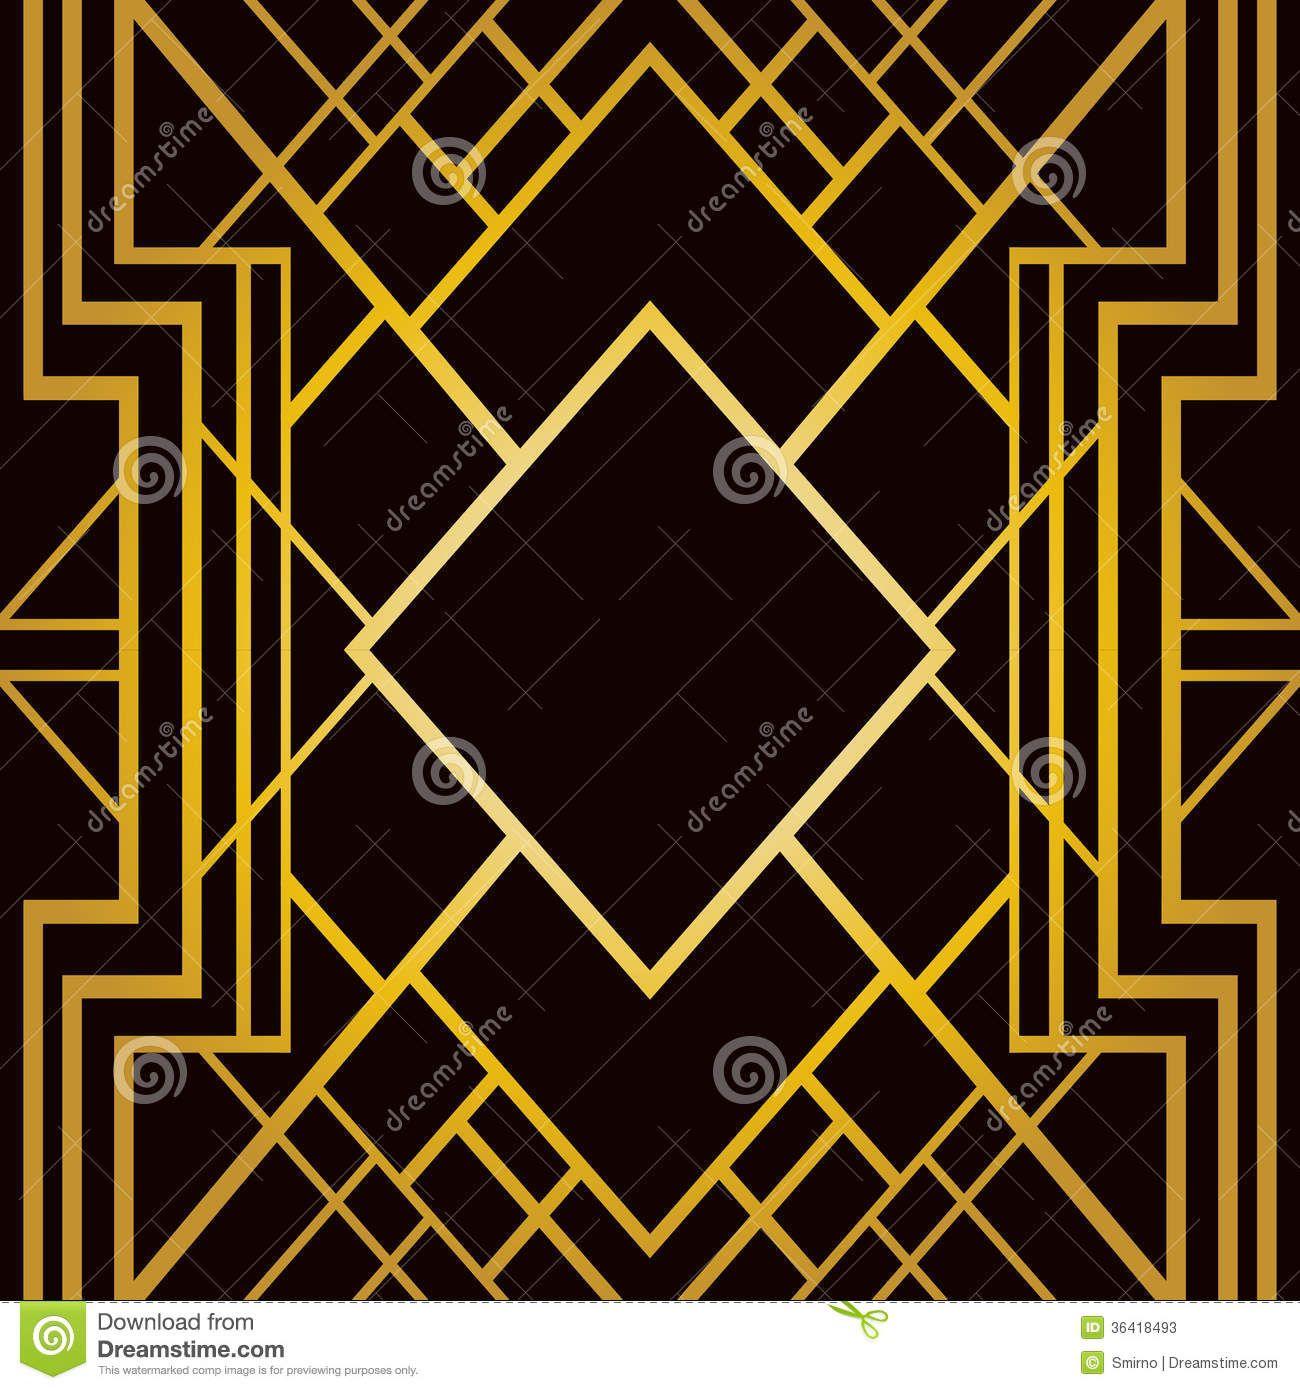 Art Deco Geometric Patterns Art Deco Geometric Pattern 1920s